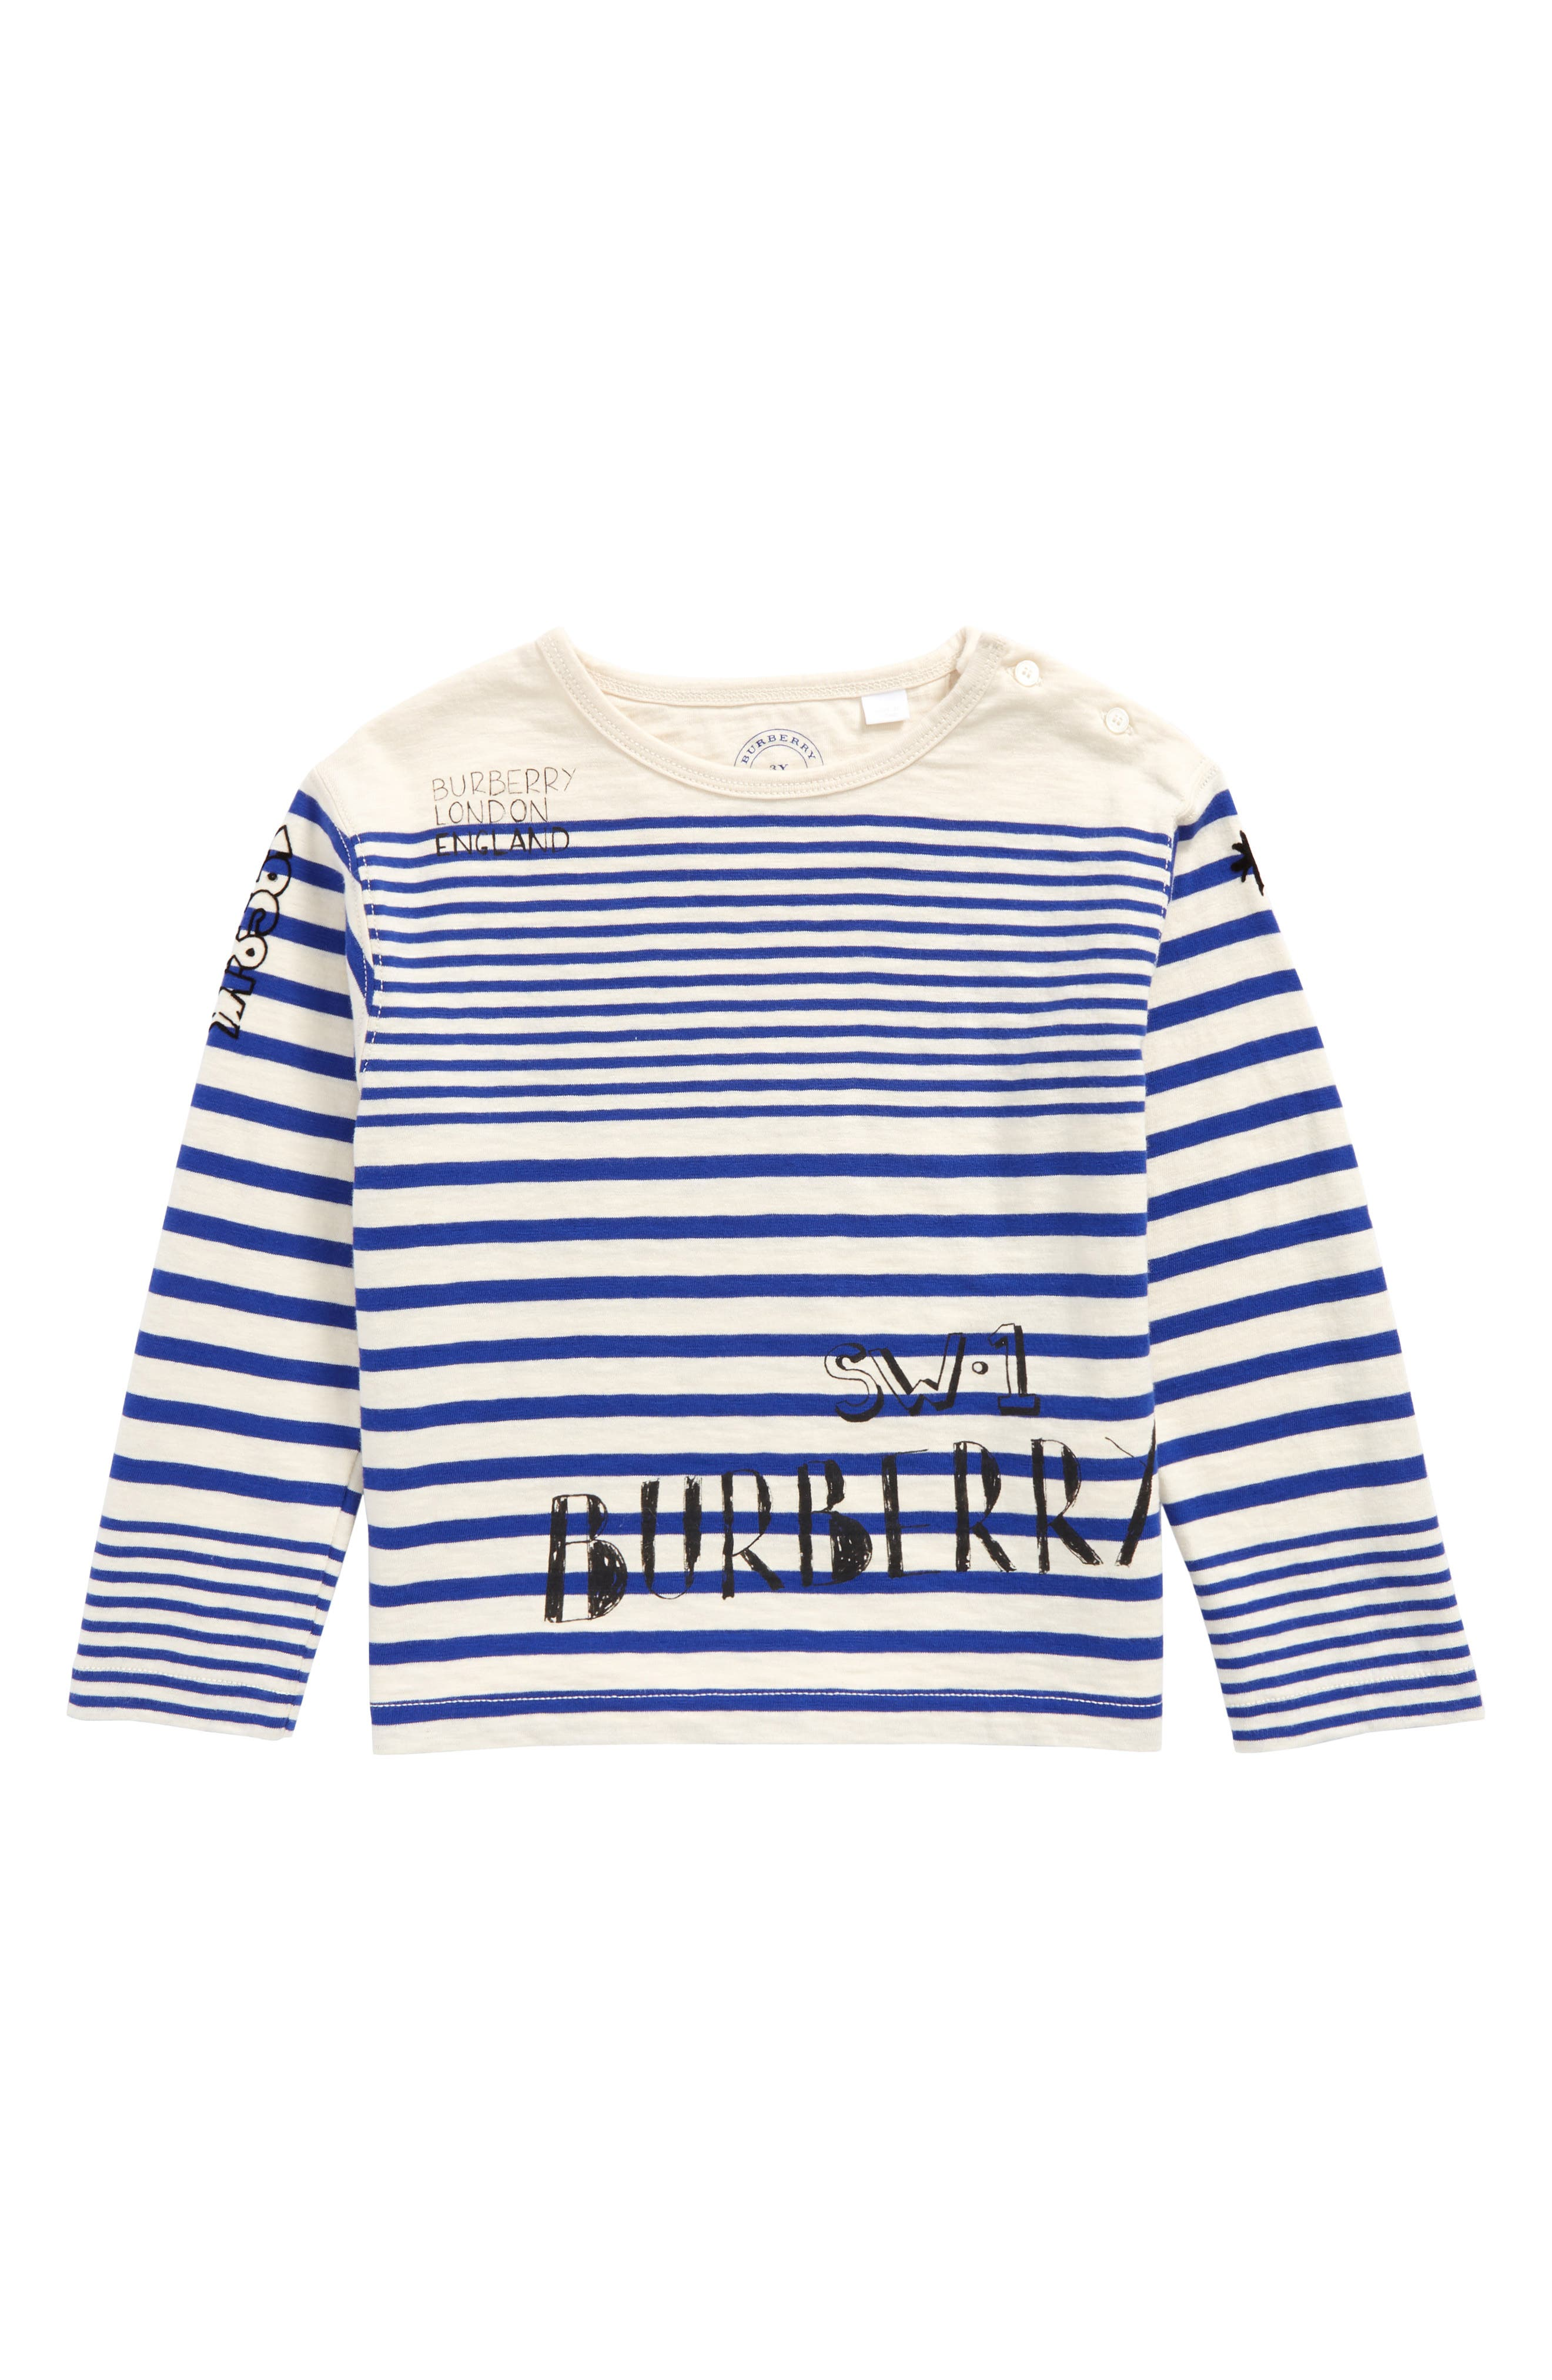 Alternate Image 1 Selected - Burberry Stripe T-Shirt (Toddler Boys)